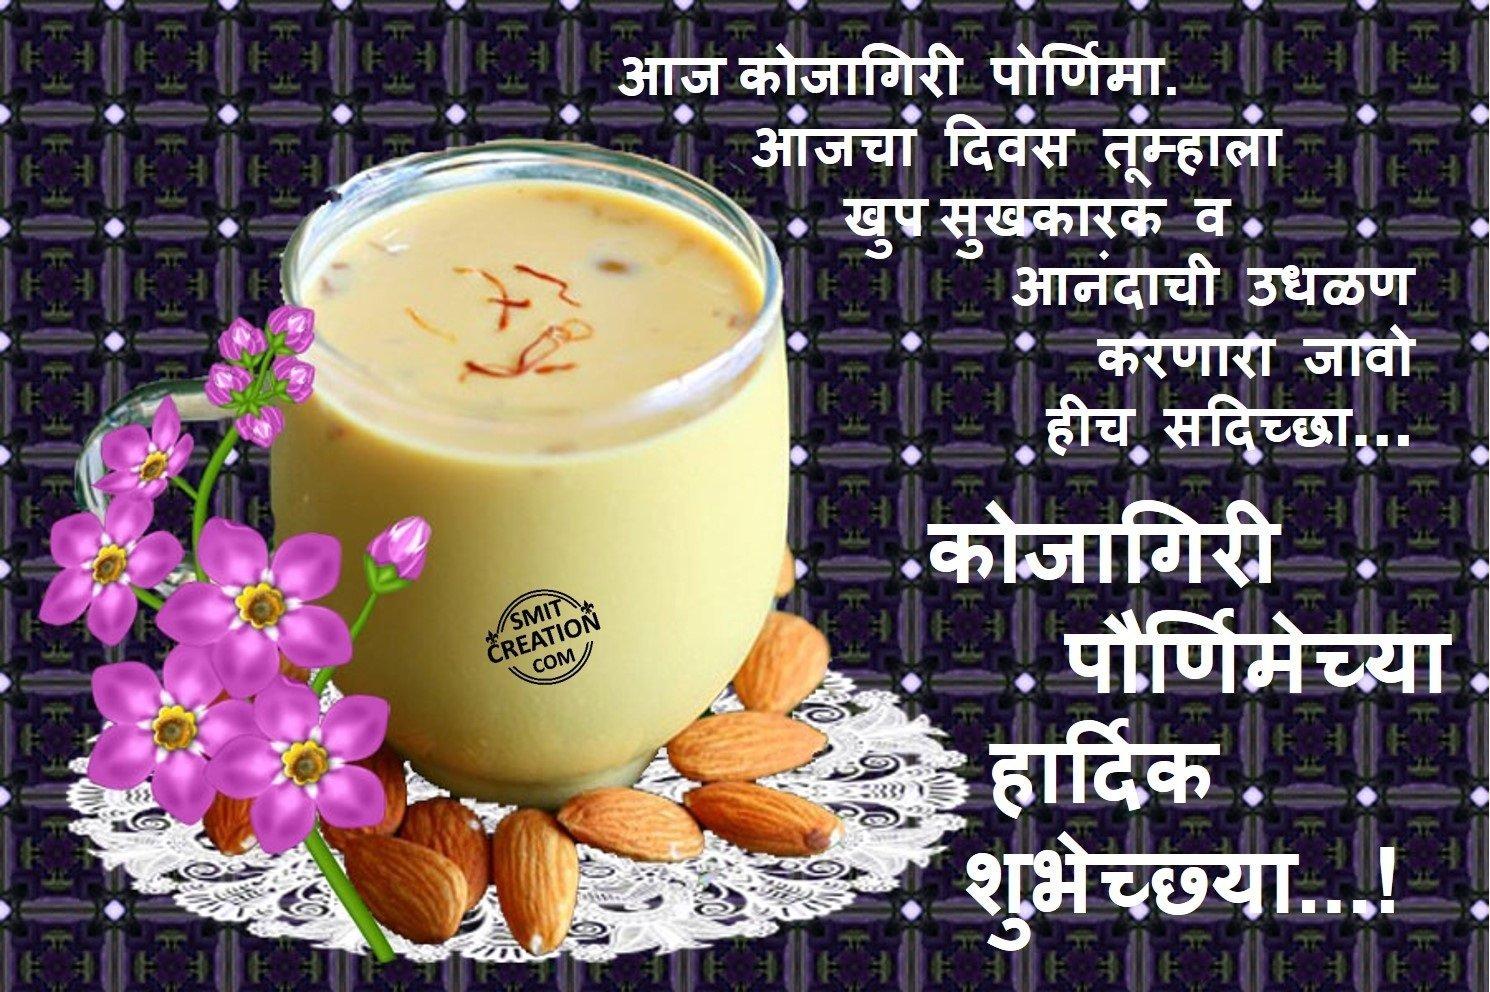 kojagiri purnima marathi